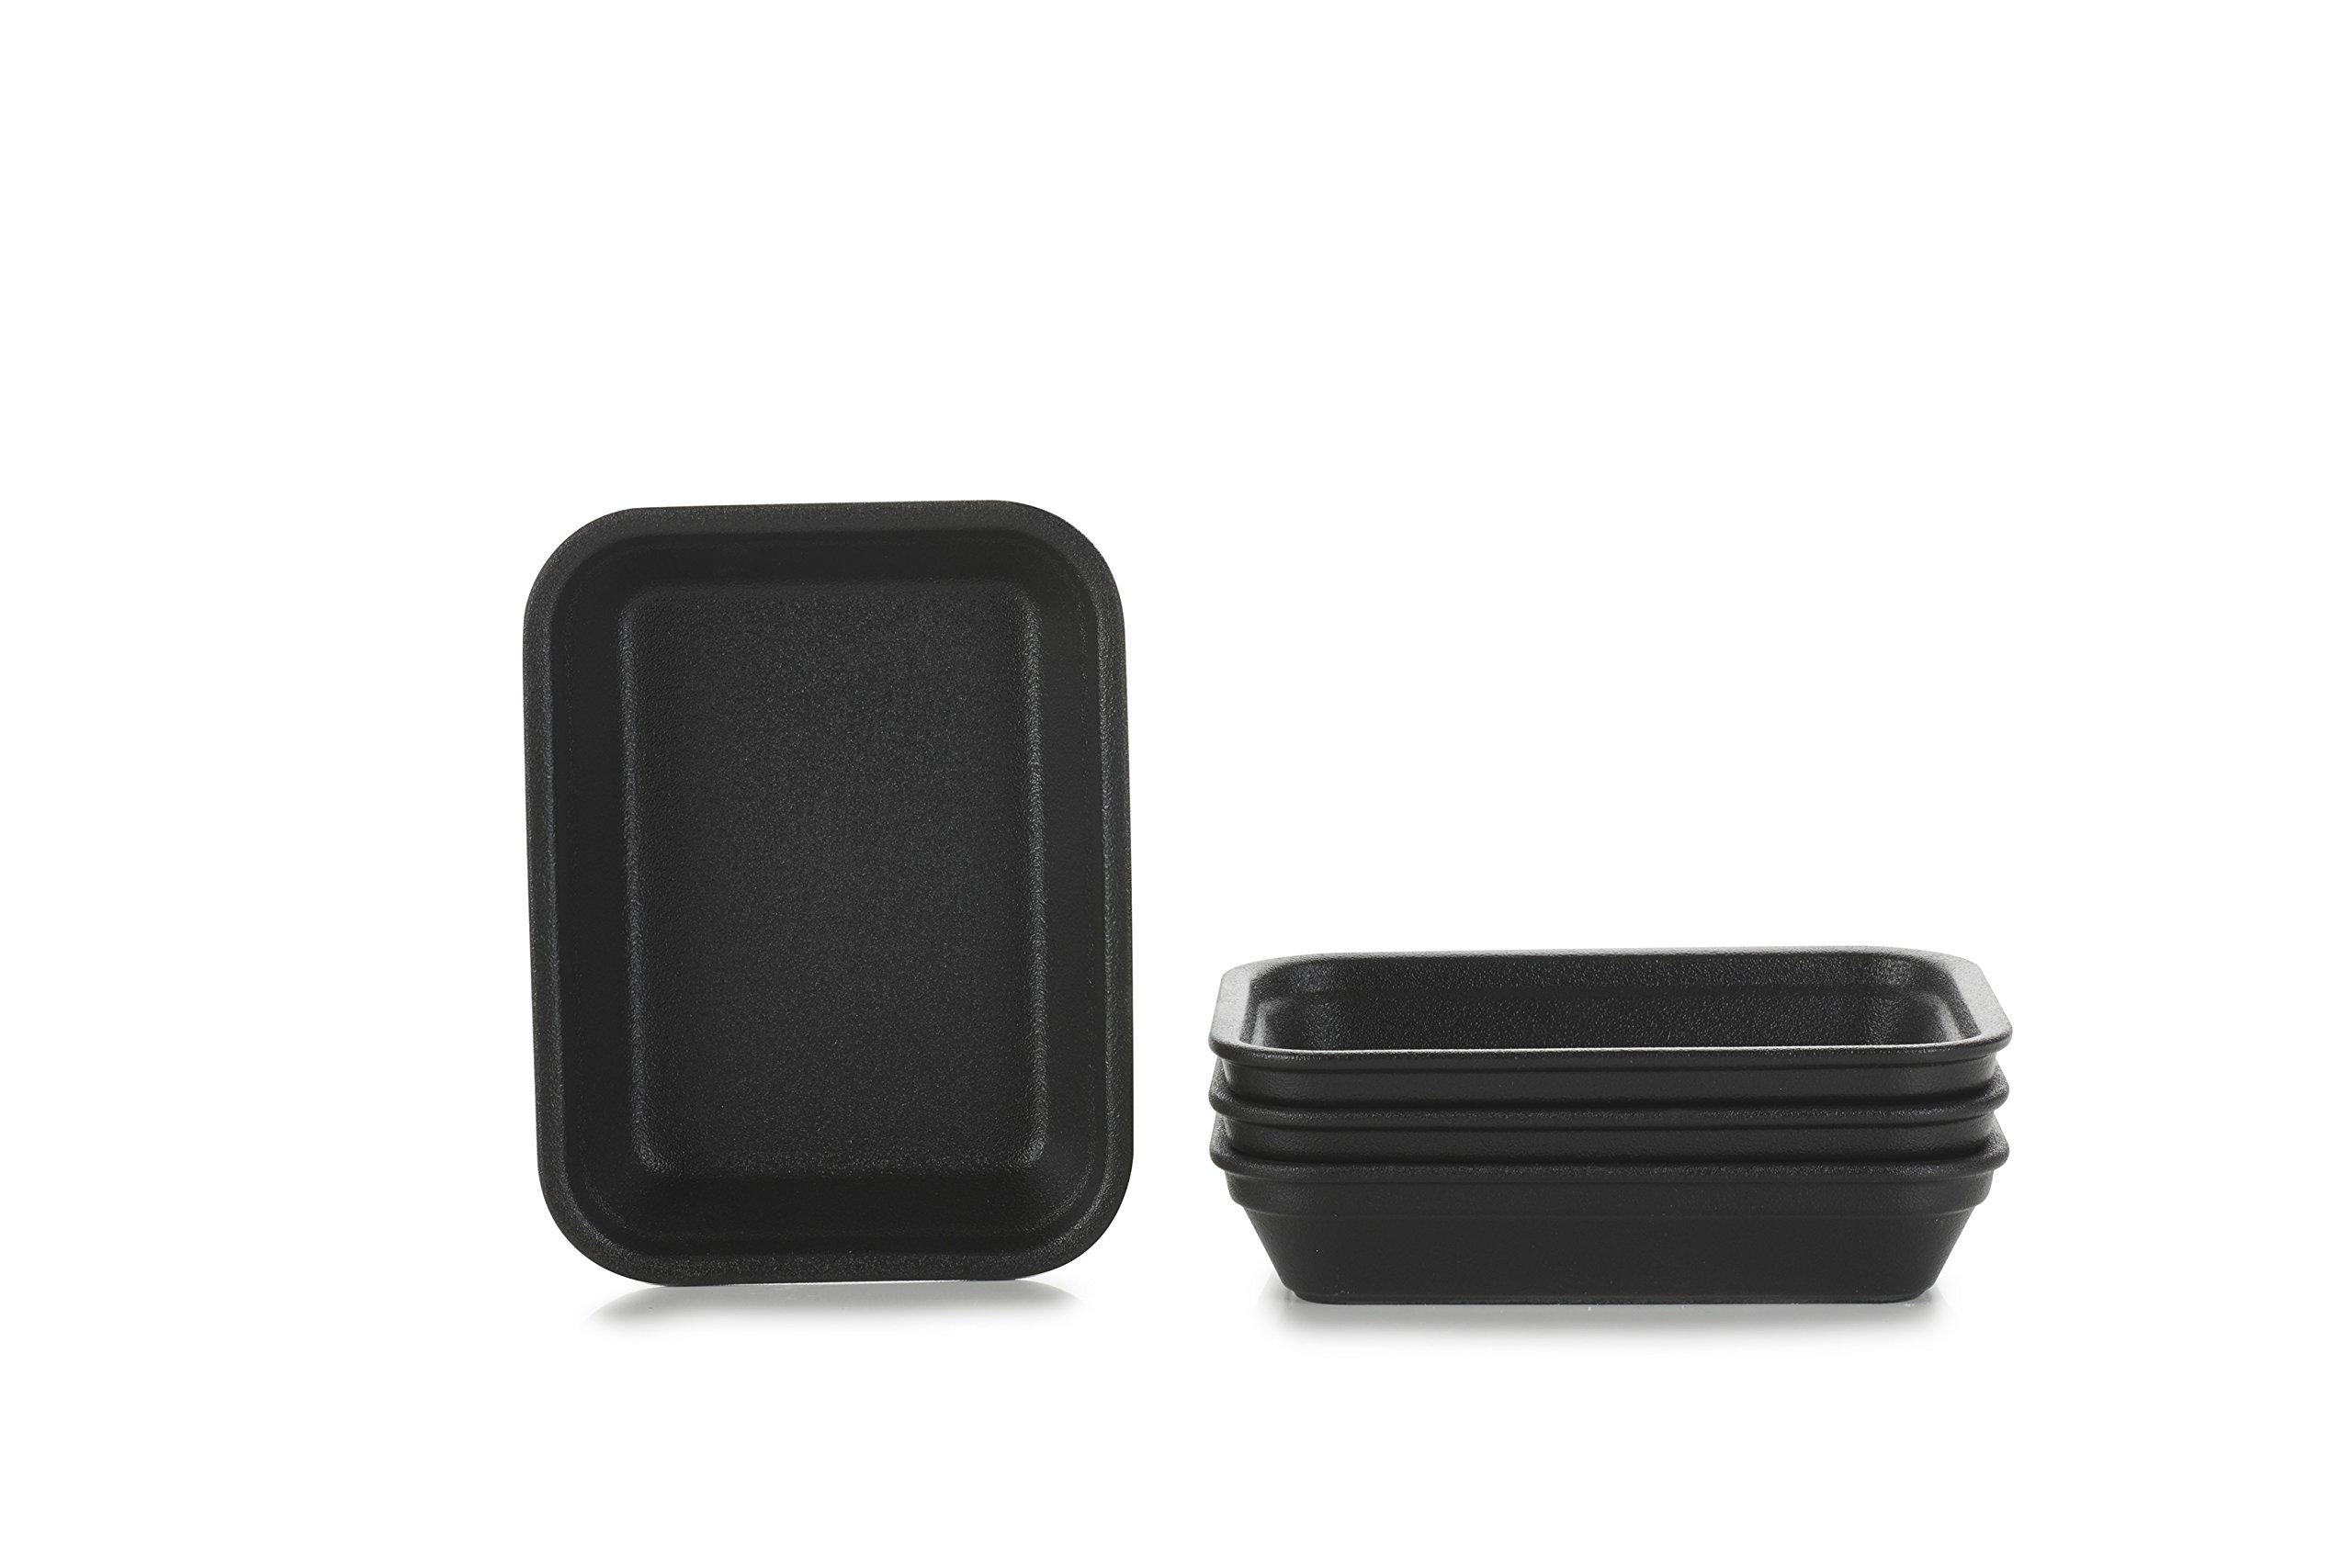 REVOL 651878/4 RPL1216N Set of 4 Rectangular Dishes, 10.5Oz, Cast Iron Style